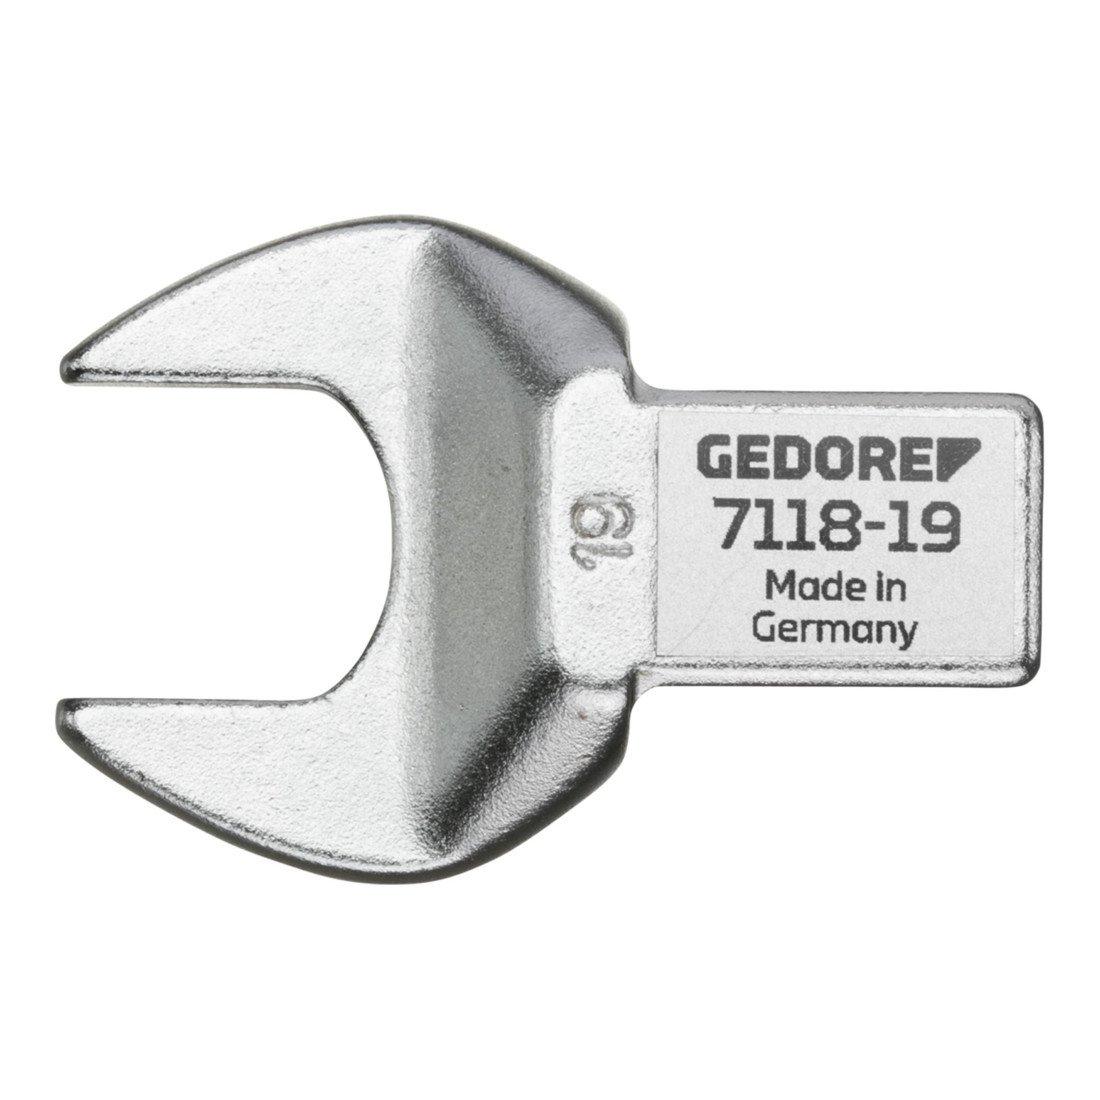 GEDORE 7118-22 Rectangular Open end Fitting SE 14x18, 22 mm